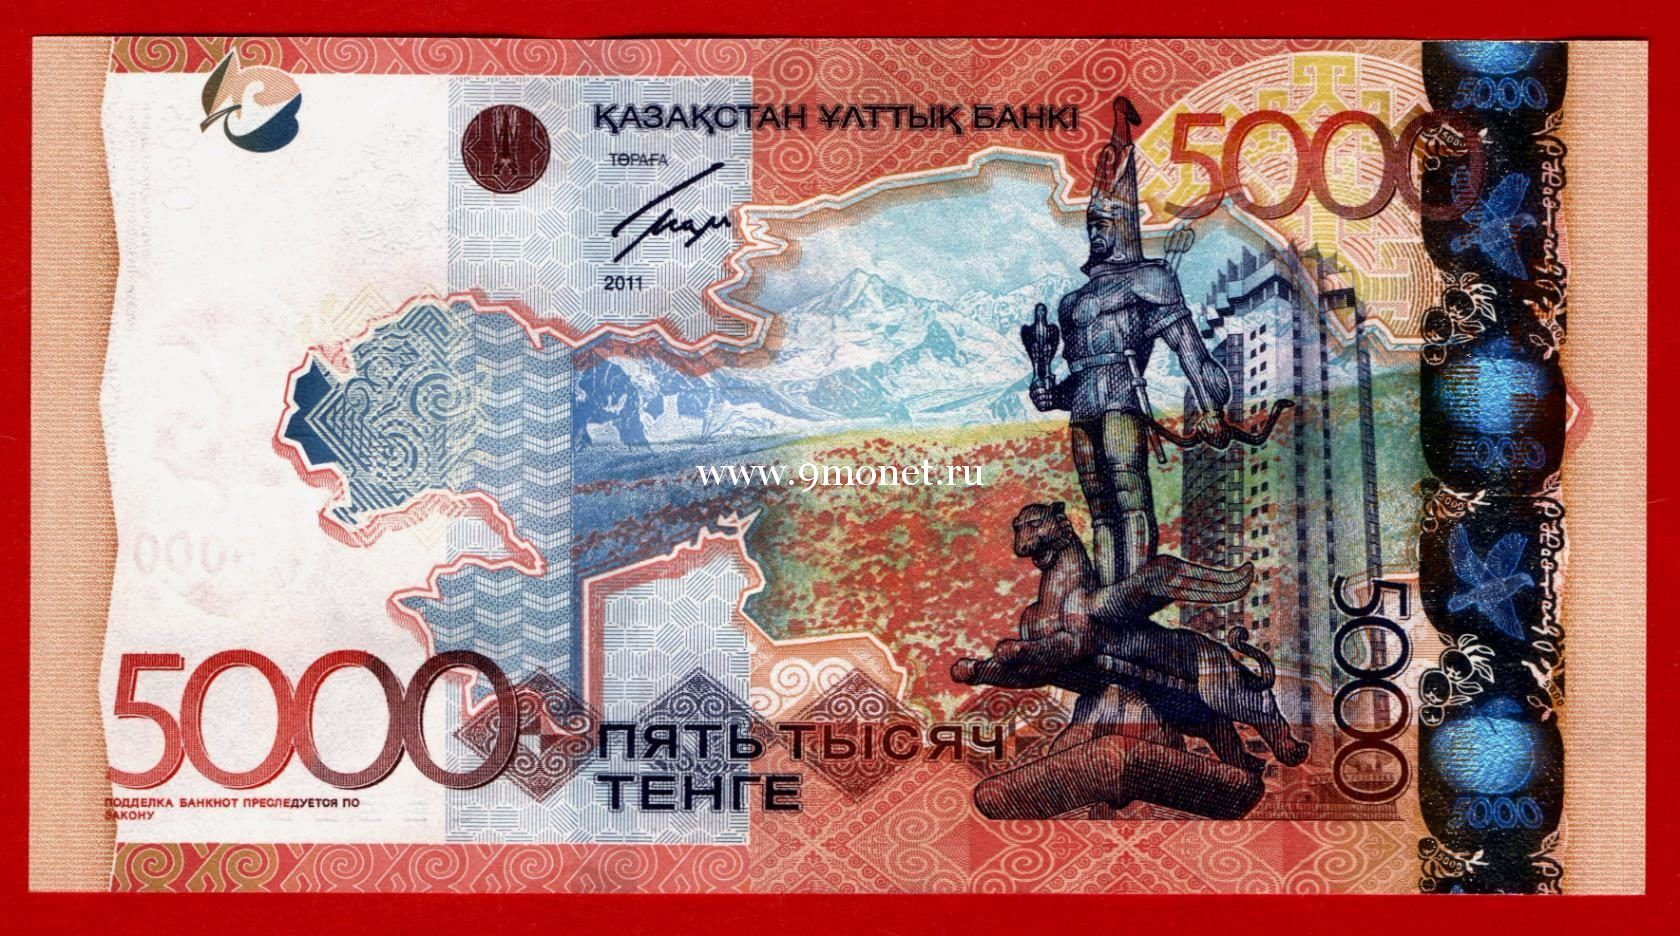 2011 год Казахстан. Банкнота 5000 тенге. UNC